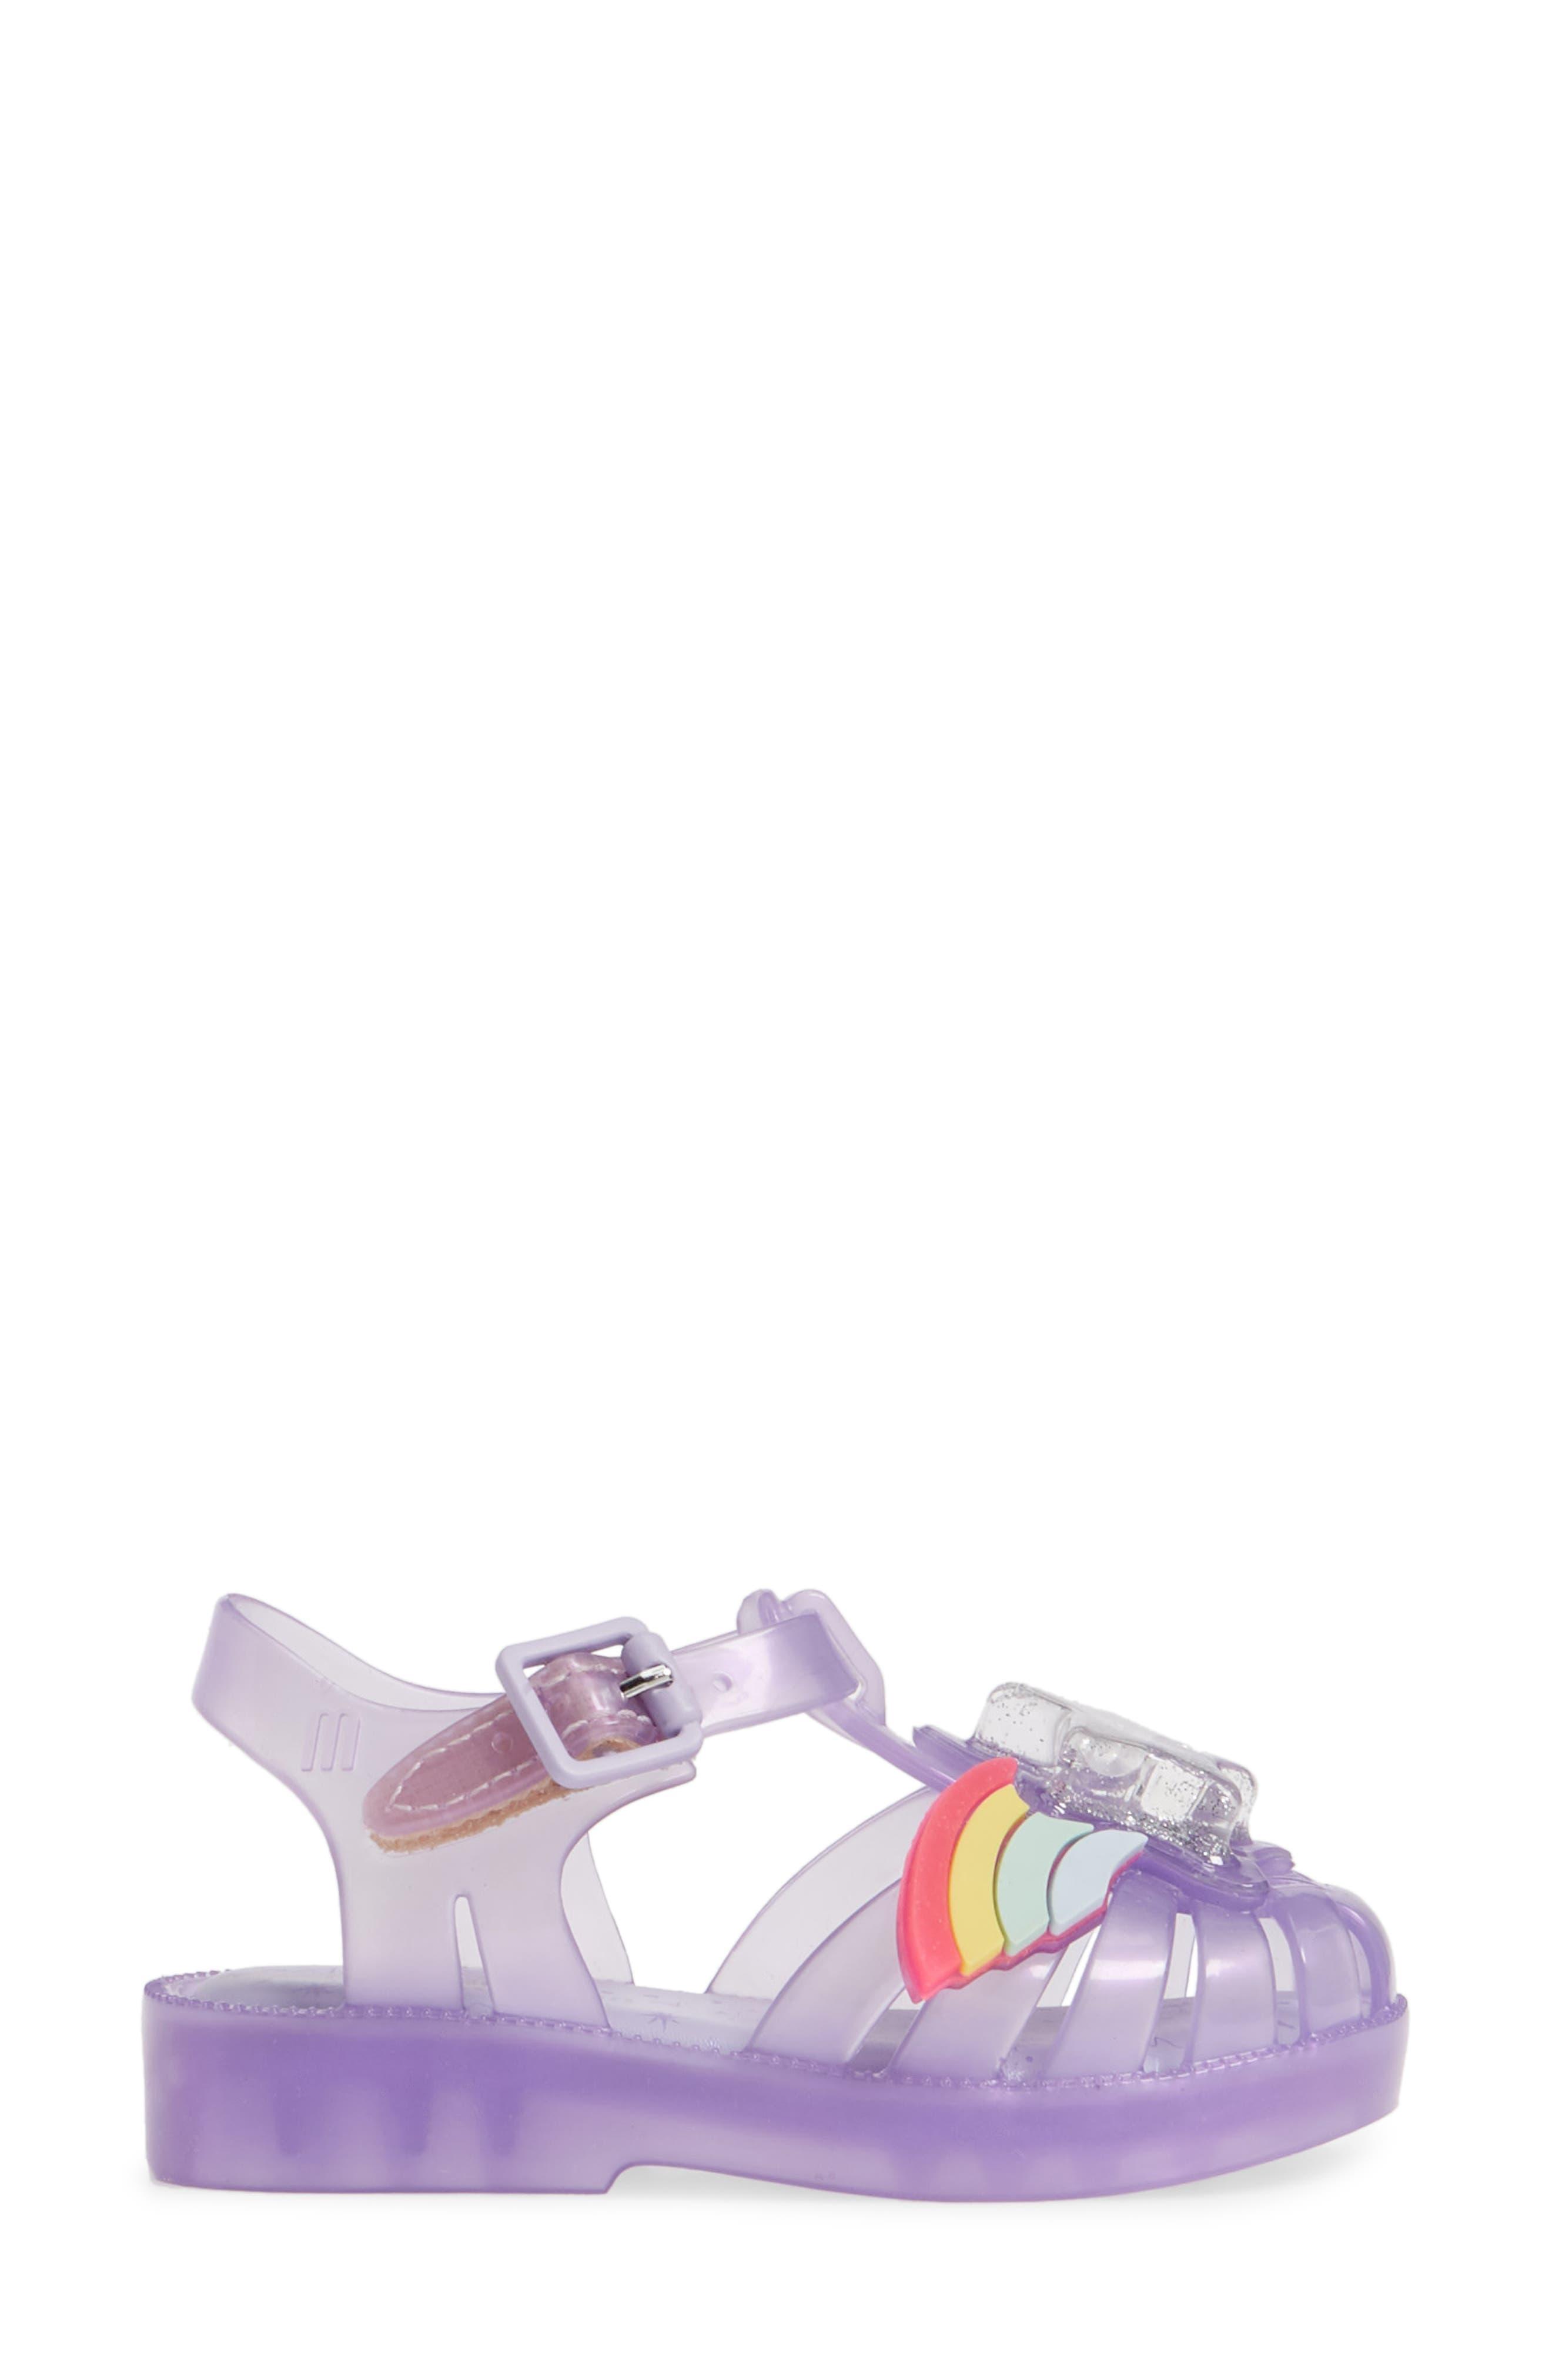 MINI MELISSA, Possession II Glitter Sandal, Alternate thumbnail 3, color, PURPLE